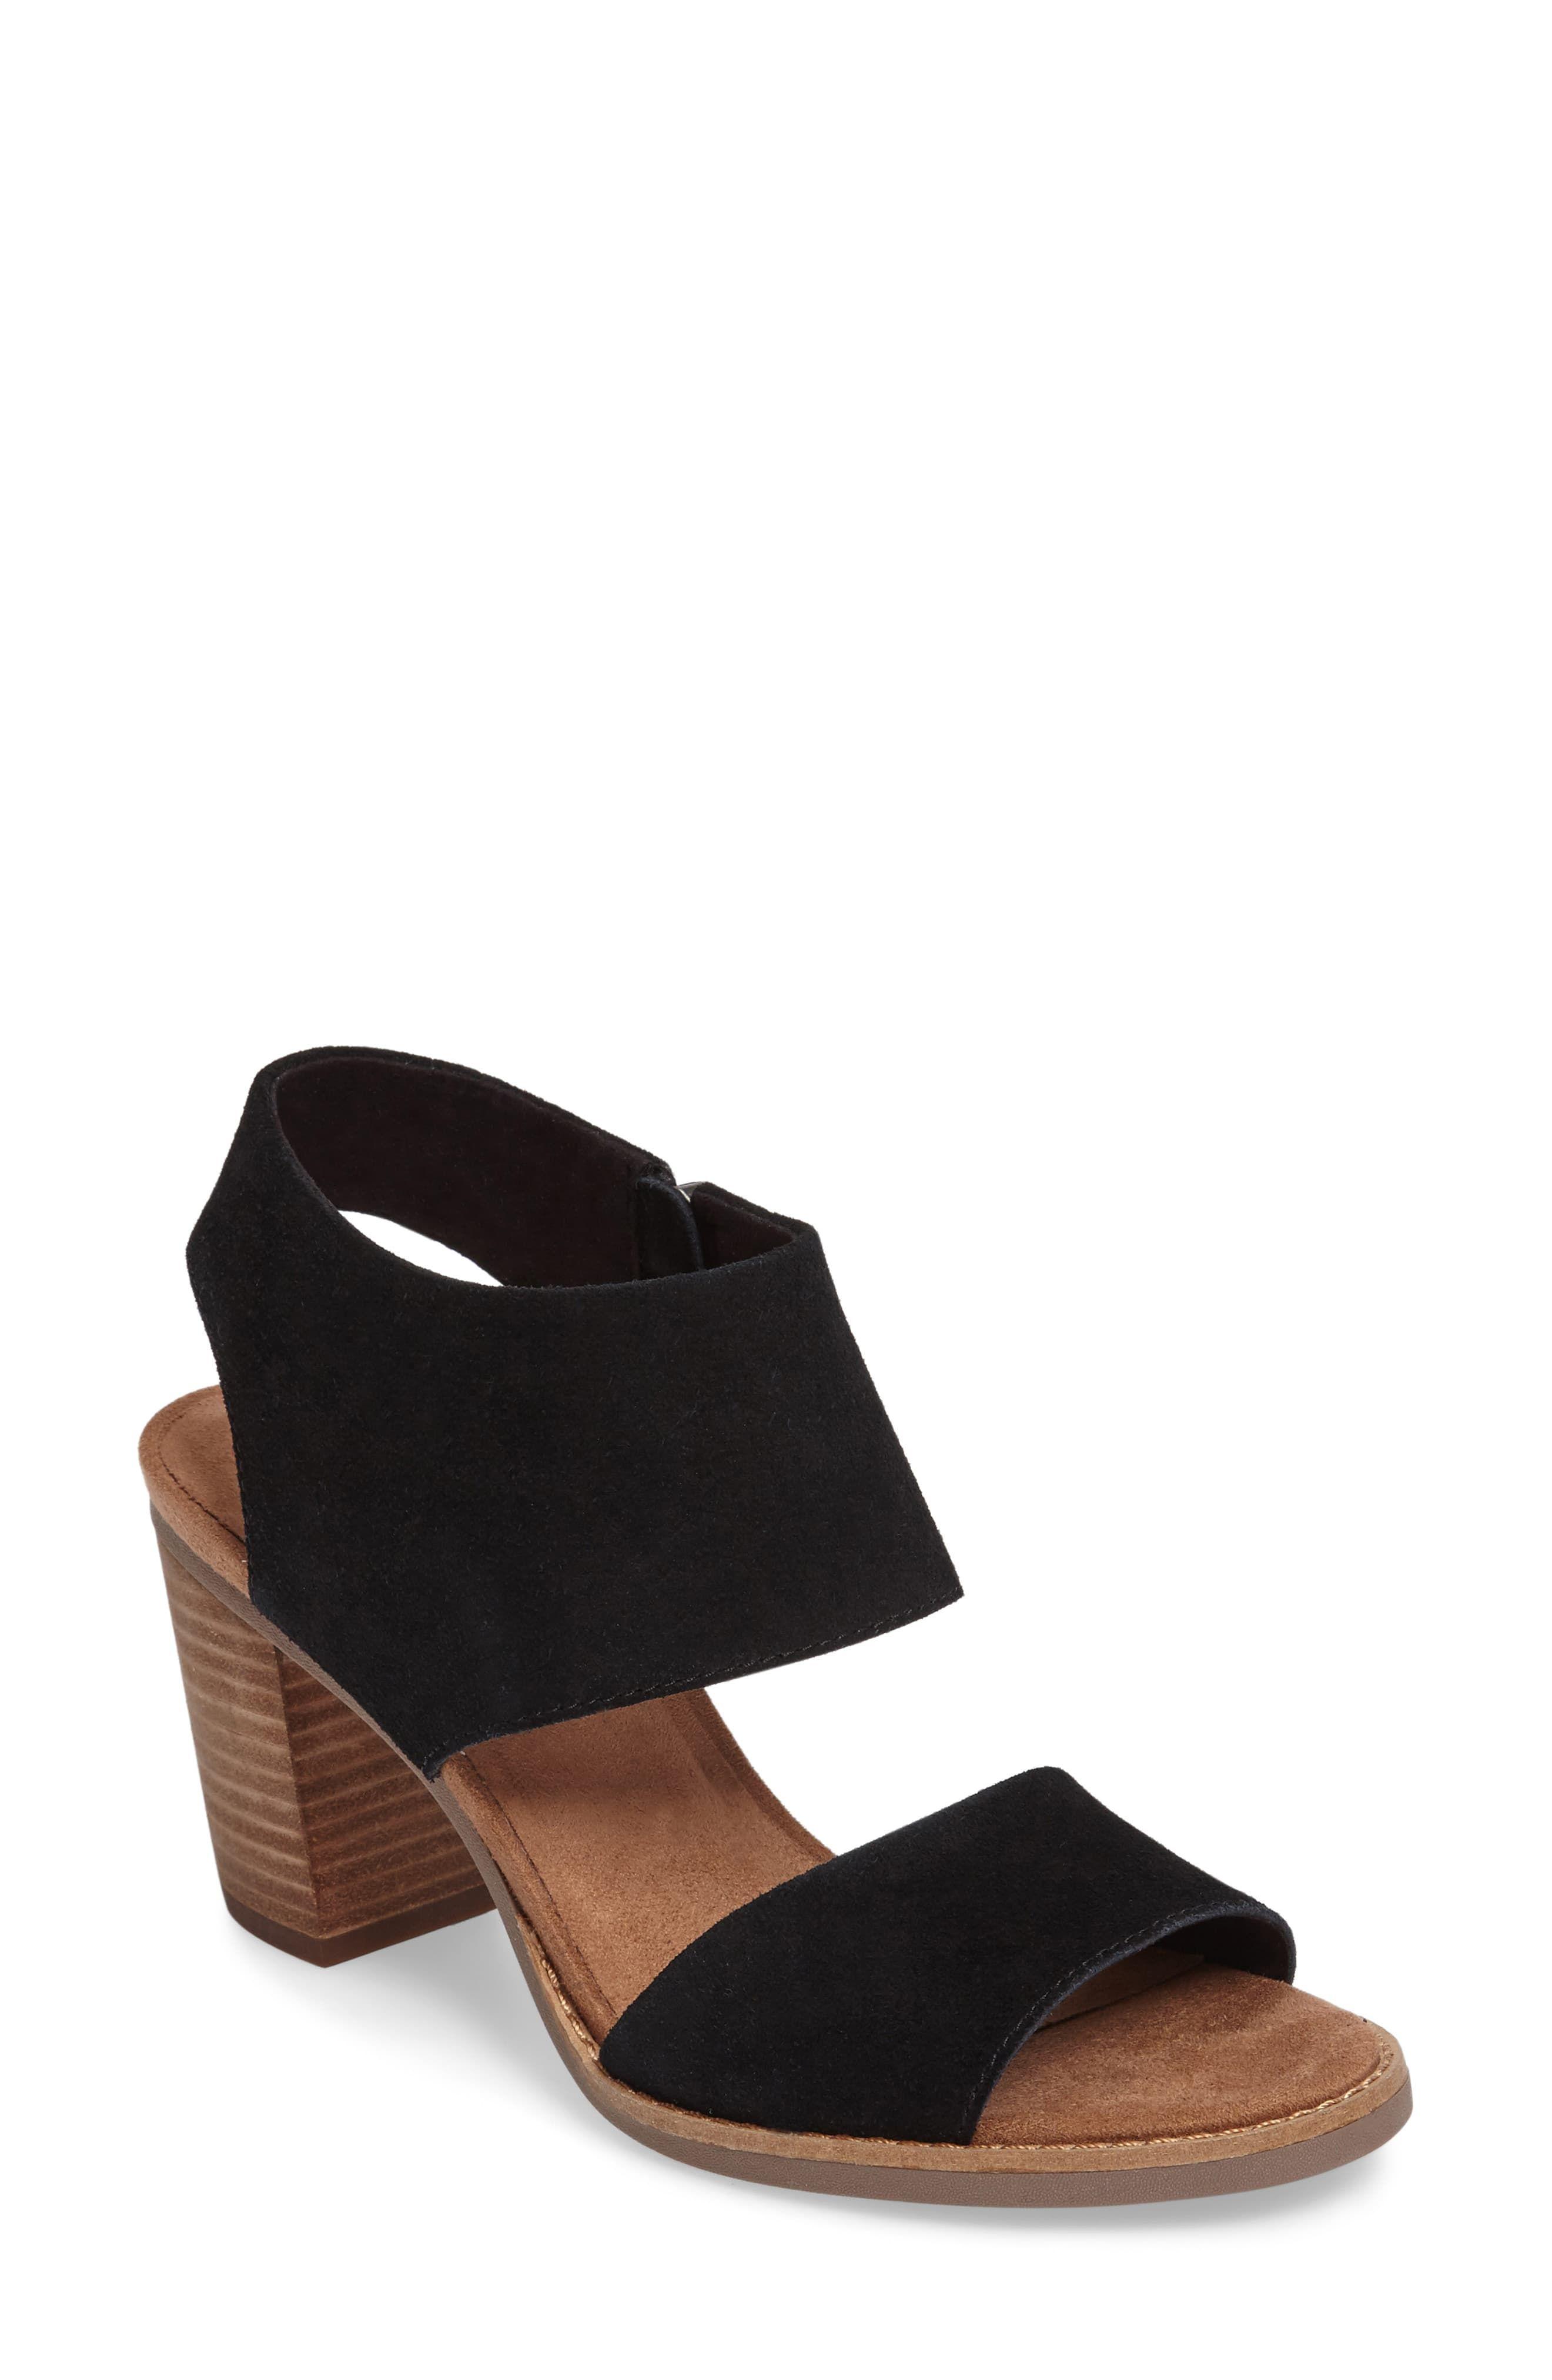 22ba82e42b4 Women's Toms Majorca Sandal, Size 5 M - White in 2019 | Products ...